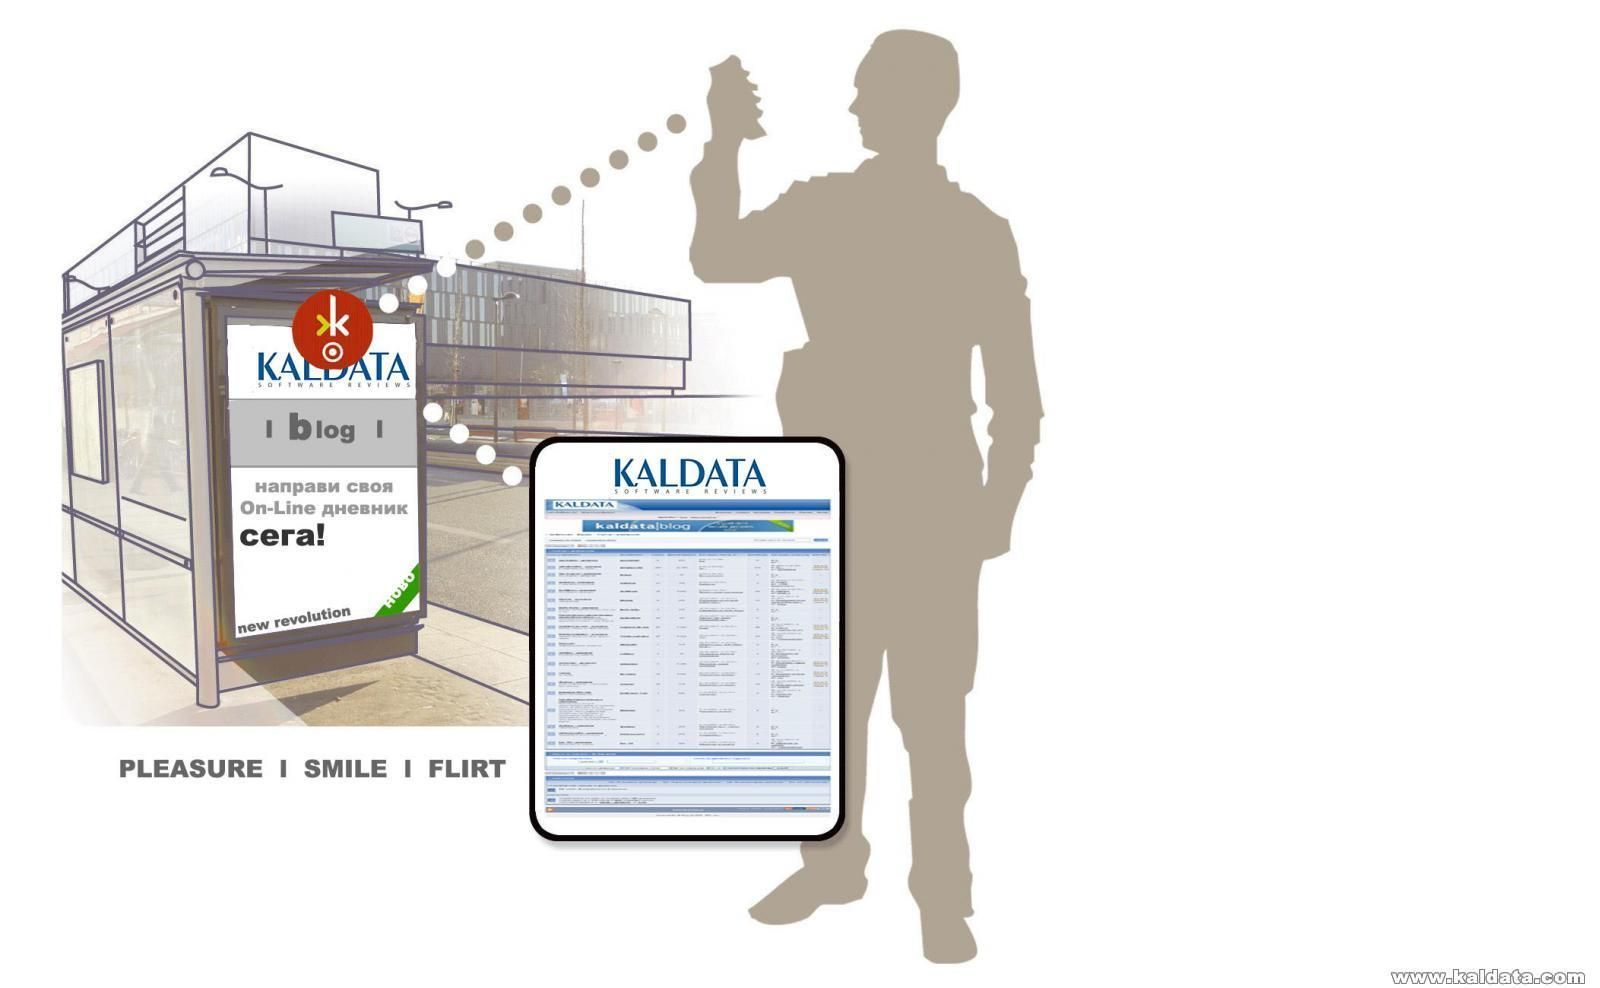 Kaldata blog